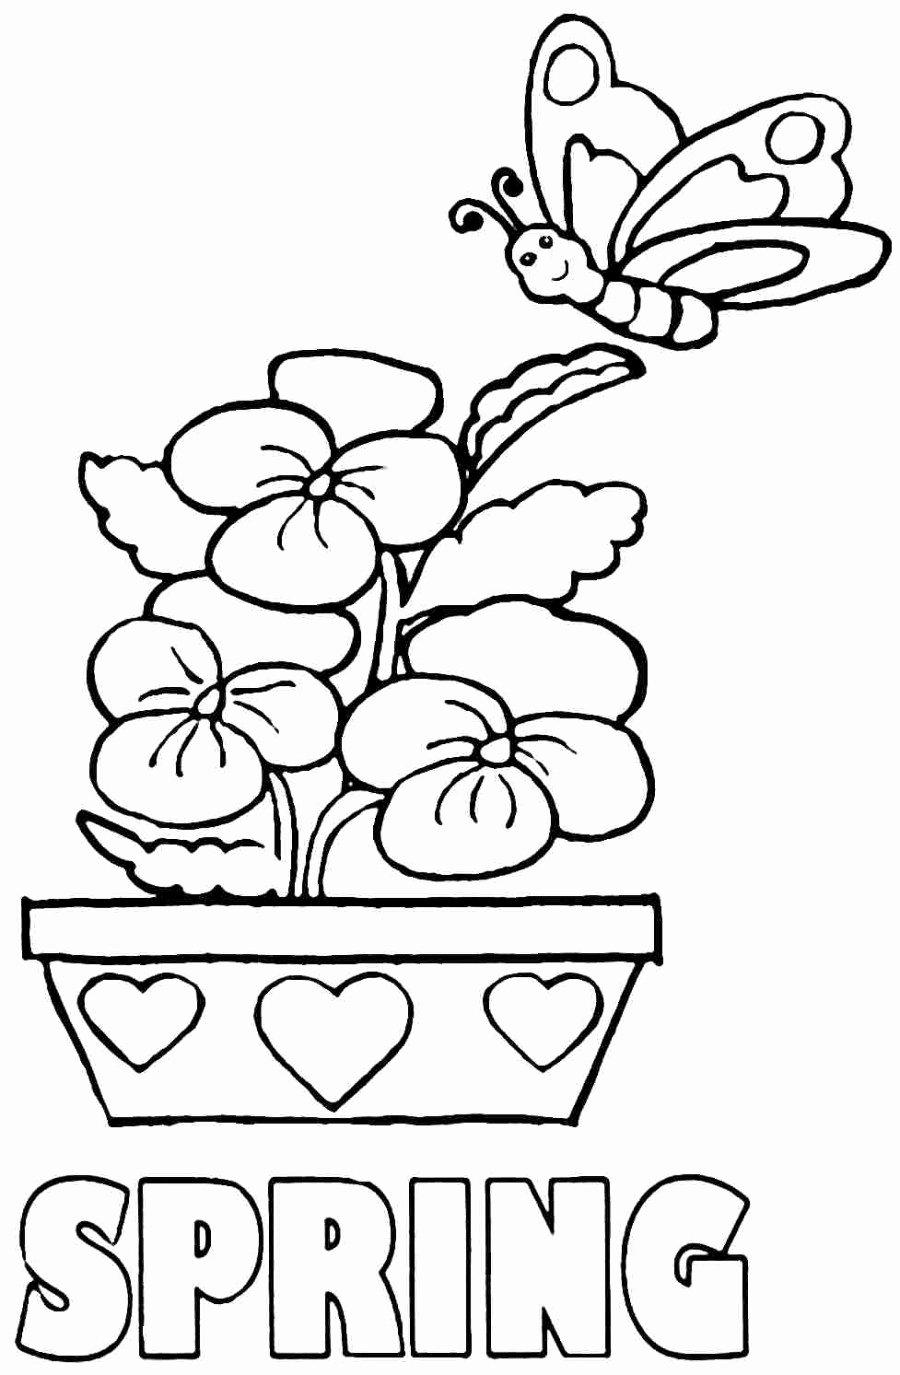 Spring Coloring Worksheets for Preschoolers Fresh Fabulous Spring Coloring Sheets for toddlers Picture